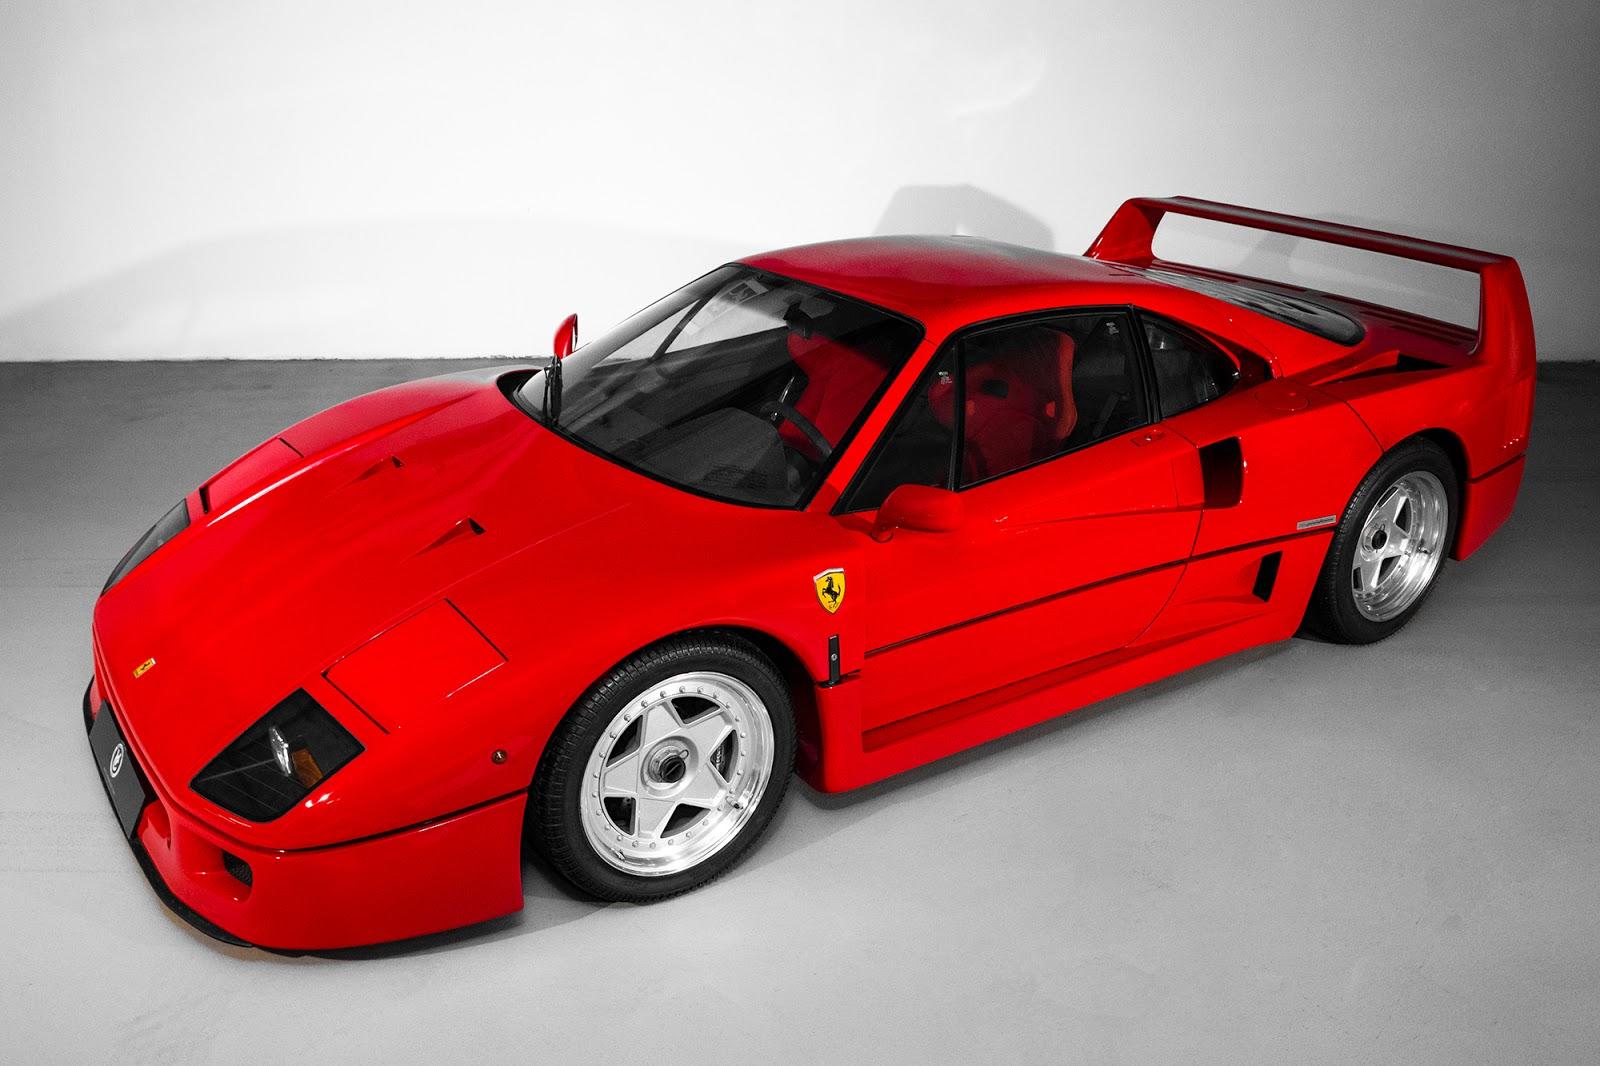 MK5 5006 F40. O μύθος, ο θρύλος F40, Ferrari, Ferrari F40, retrocar, retrocar sunday, zblog